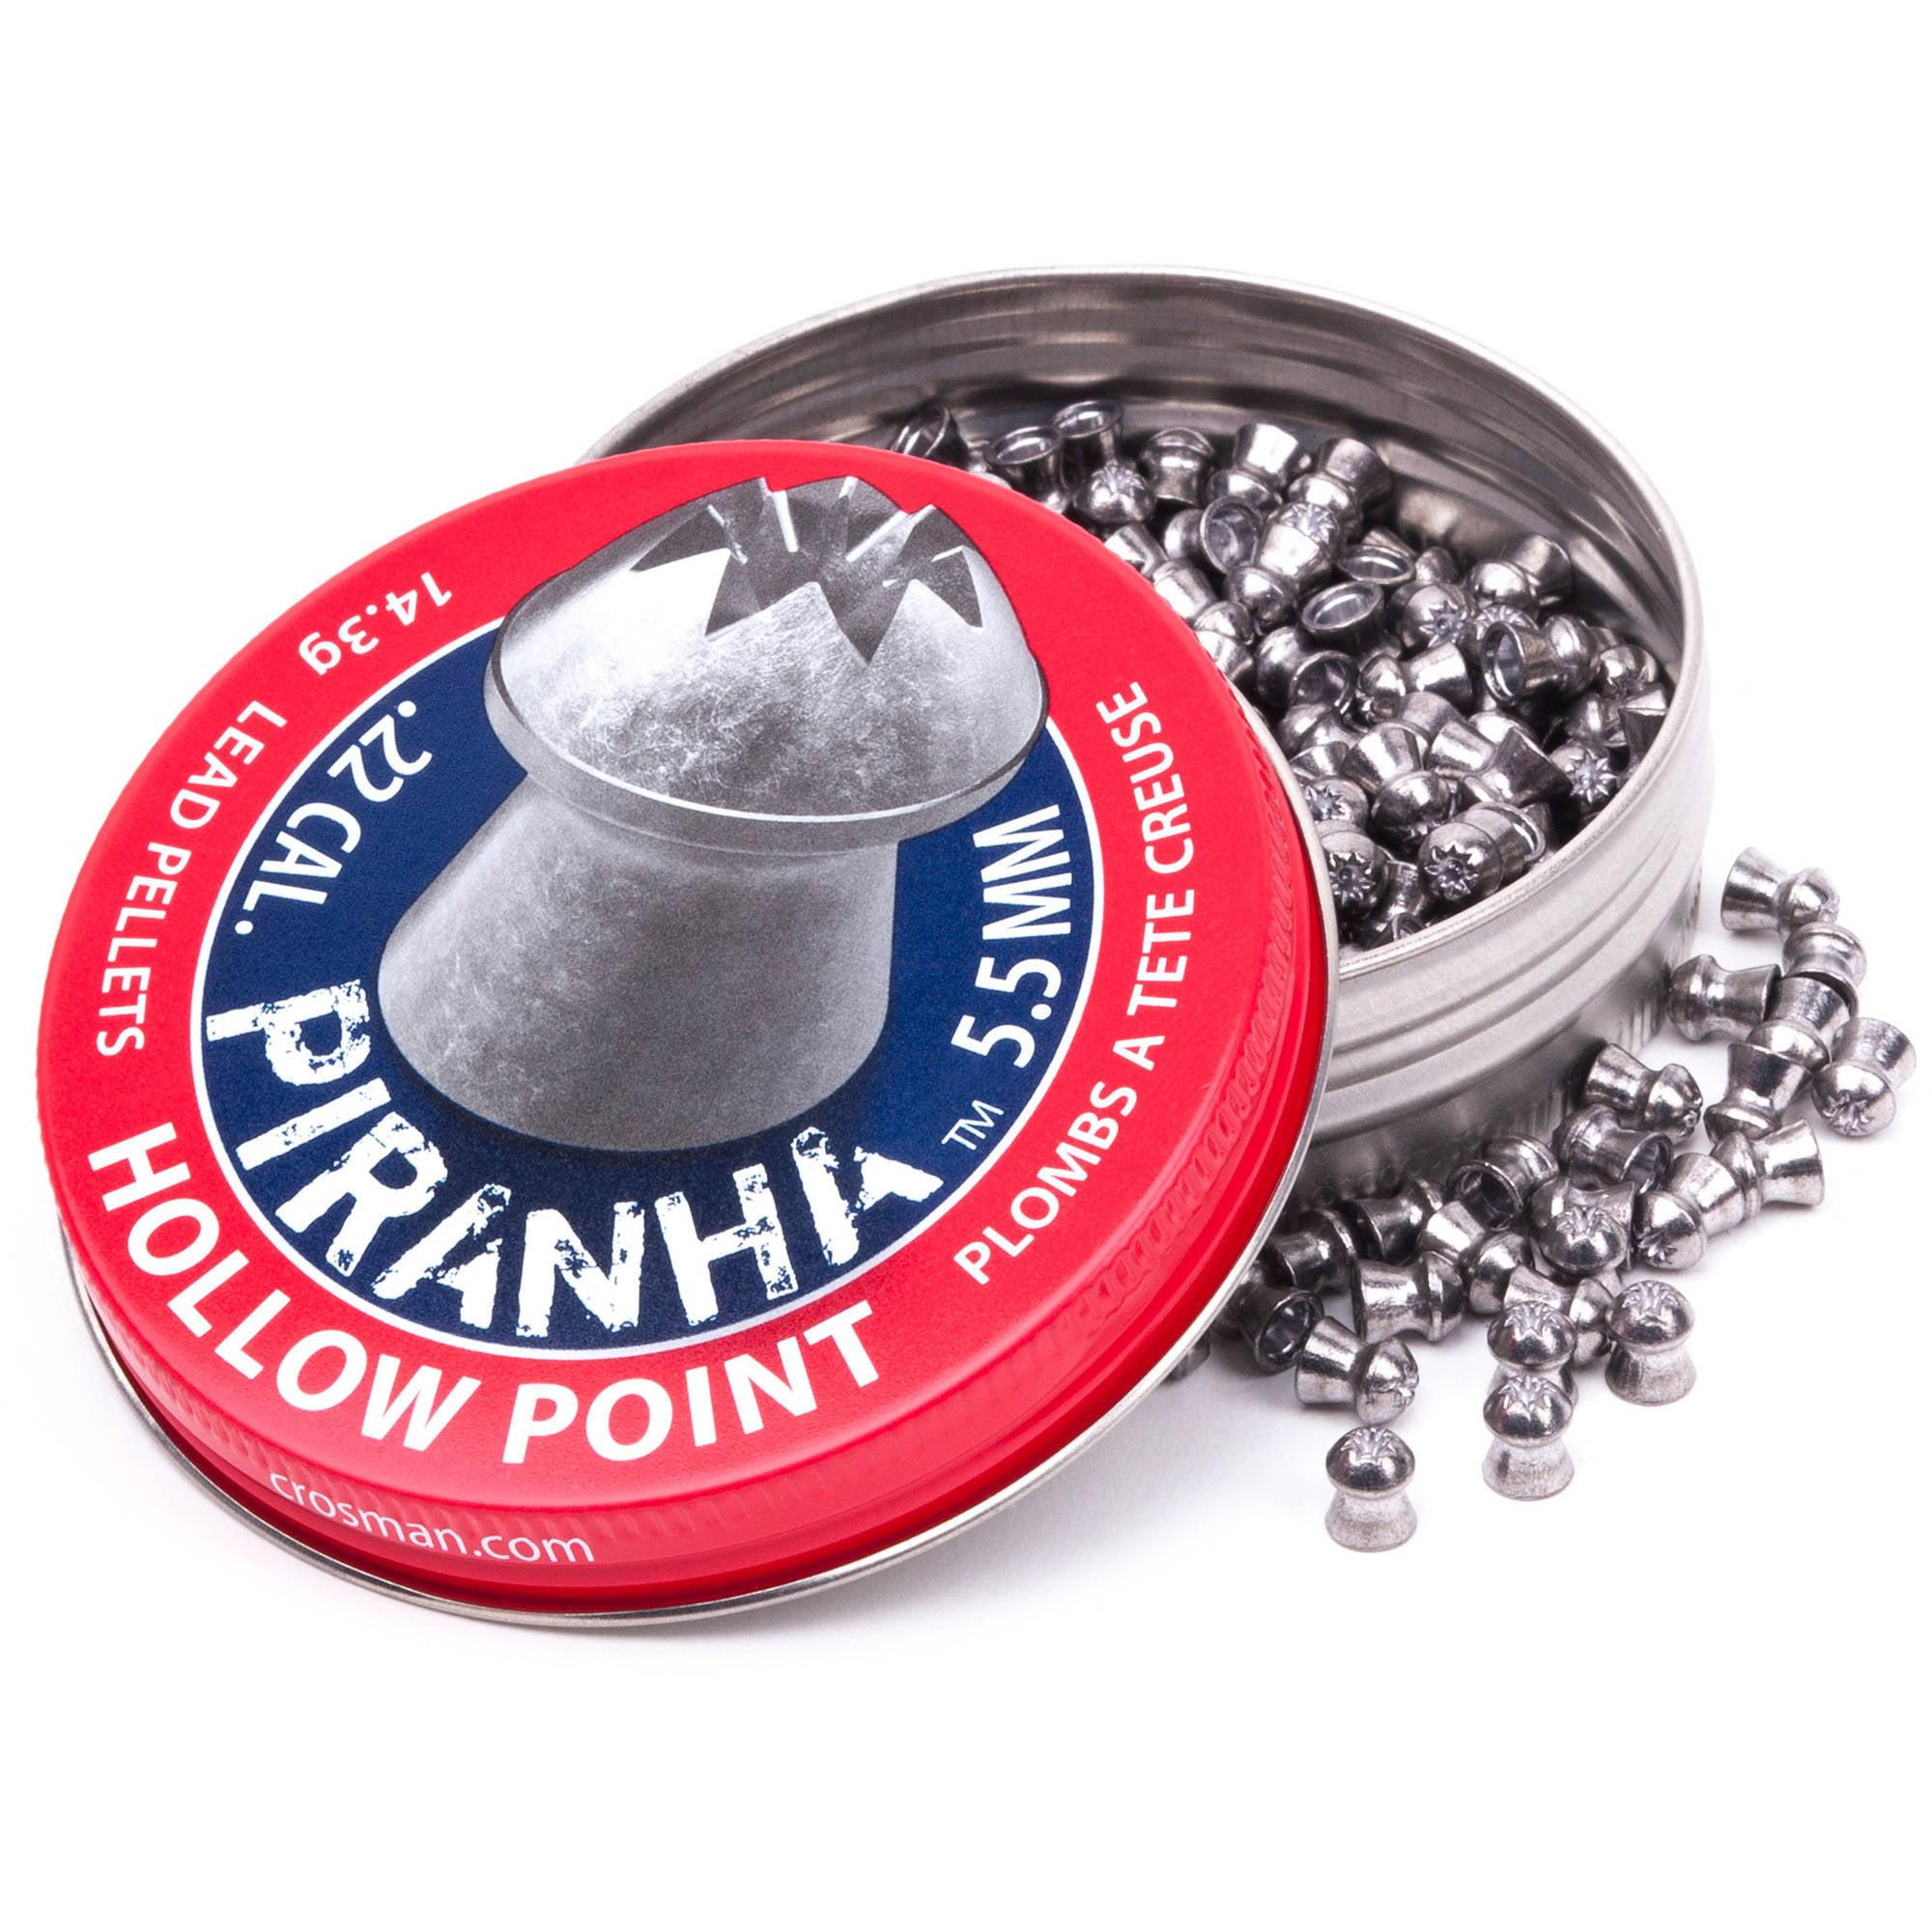 Crosman Piranha Premier .22cal Hollow Point Pellets 14.3 Grain 400ct LPPH2 by Crosman